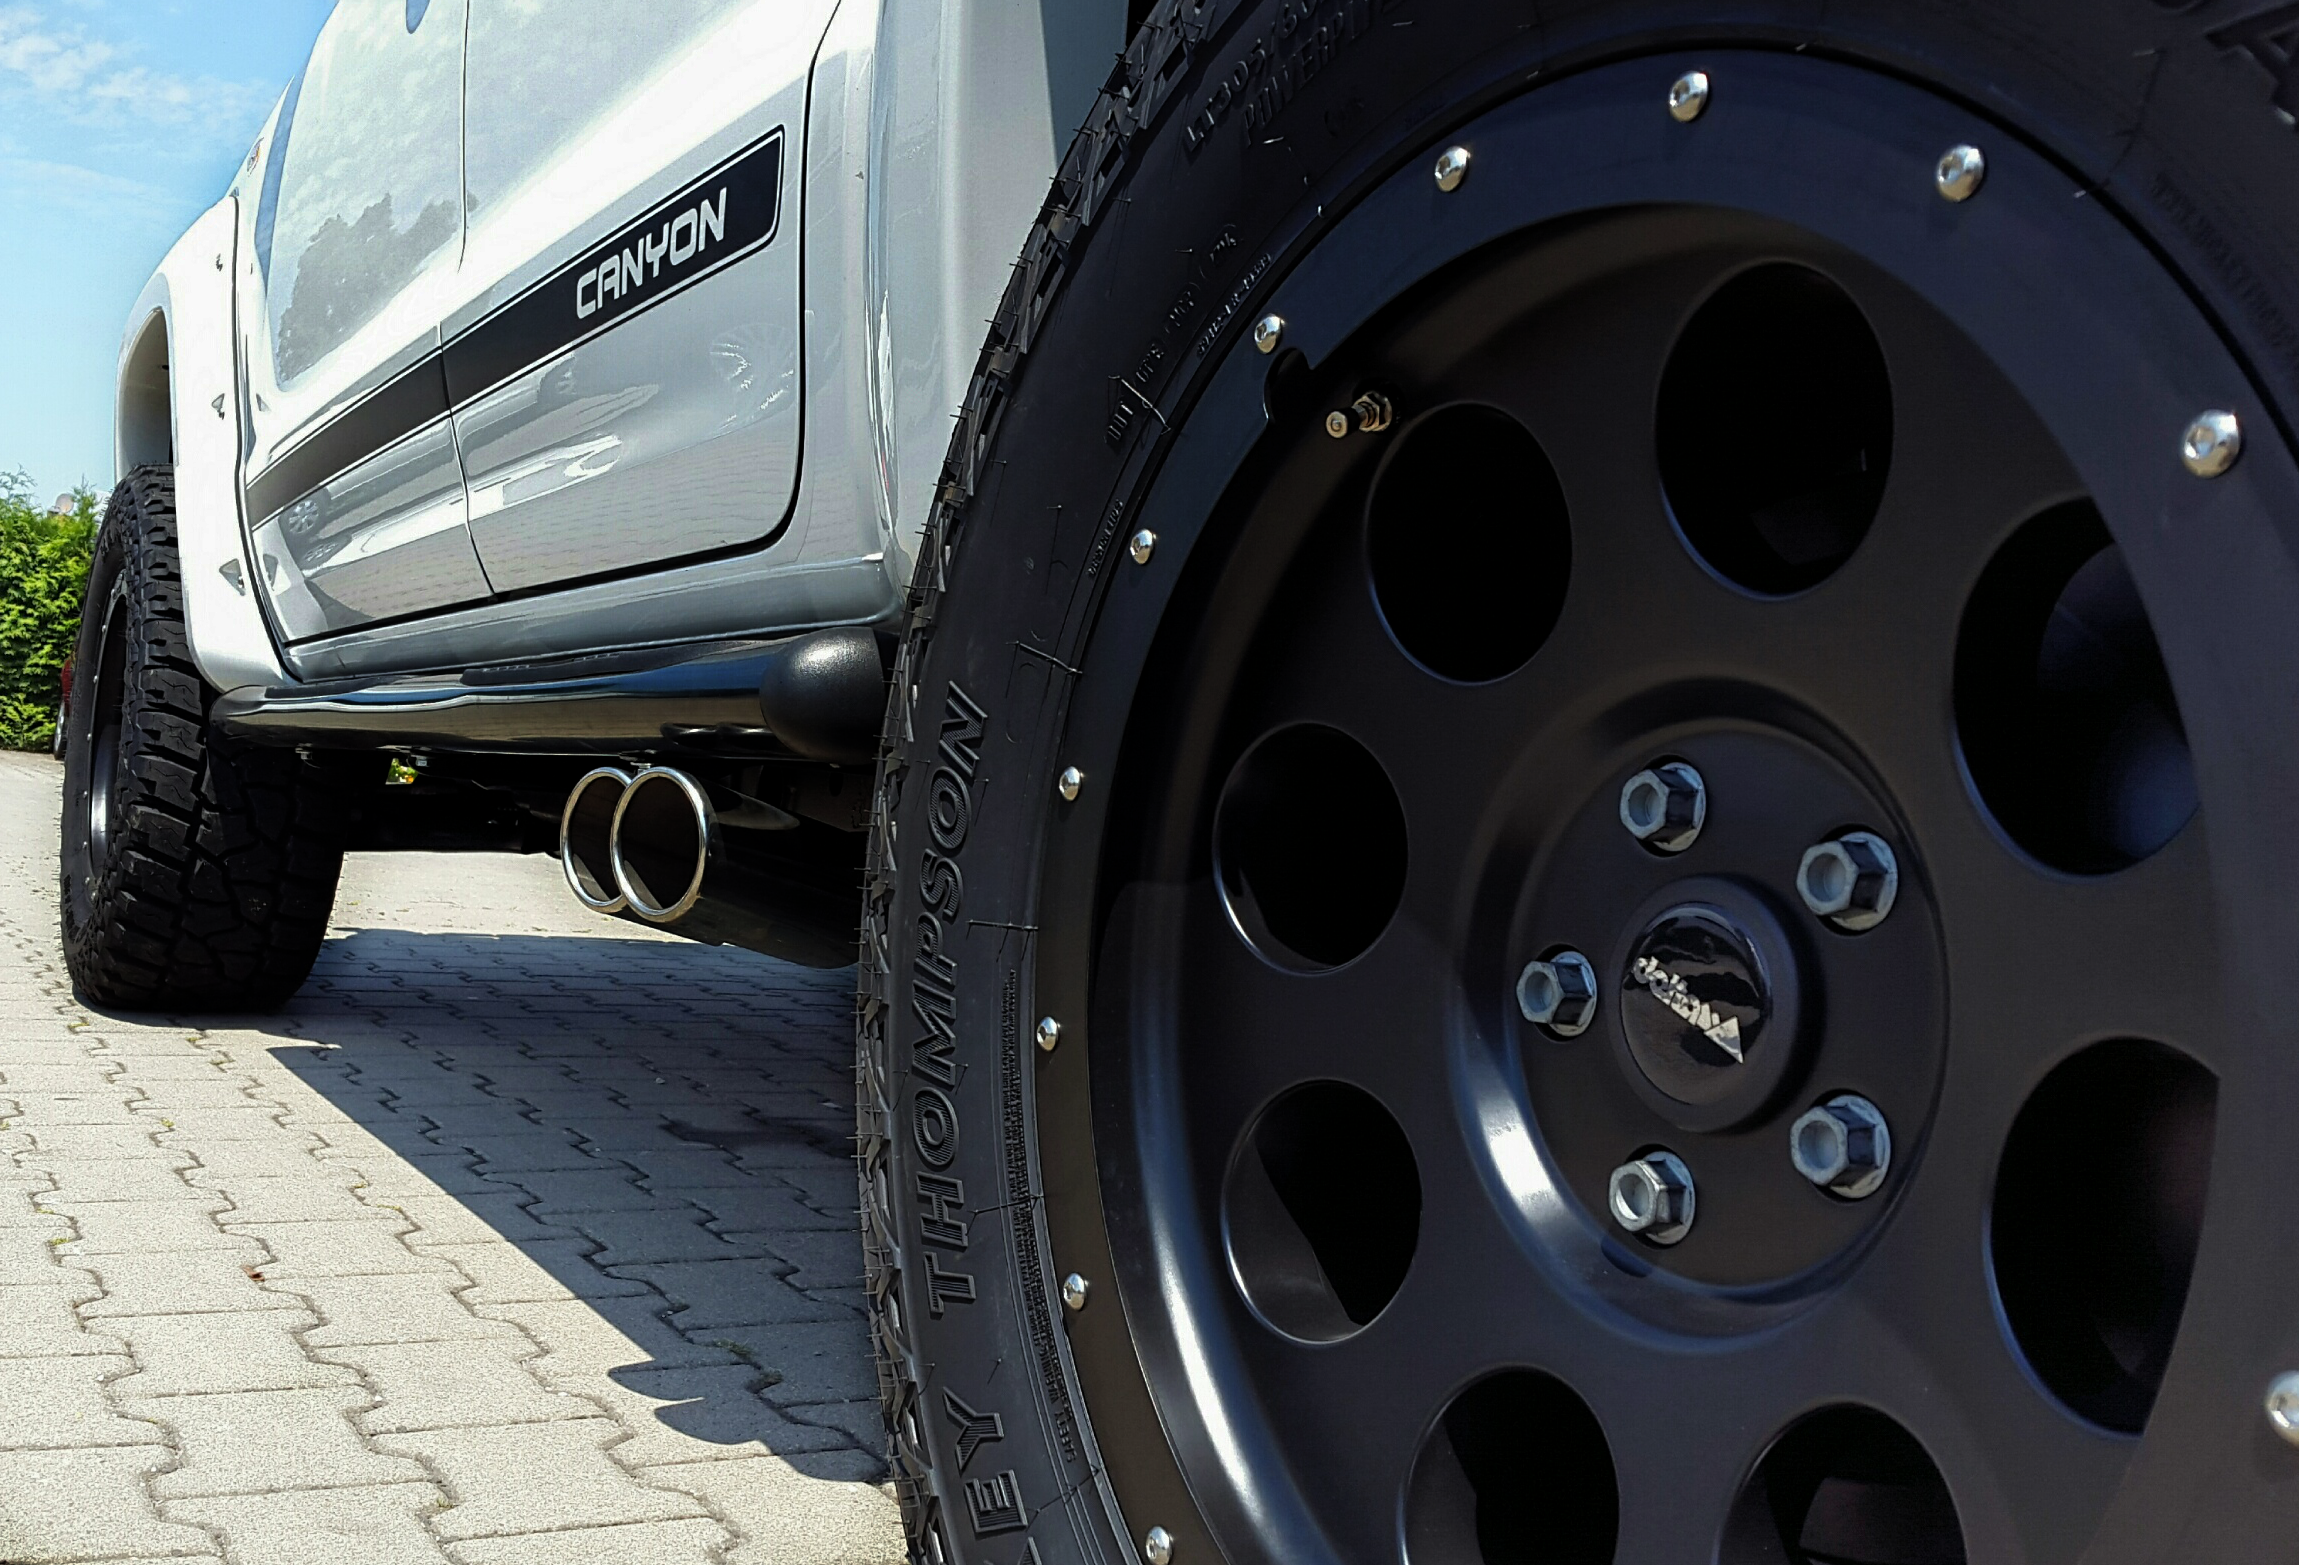 Vw Amarok With Klassik B Wheels By Delta4x4 Vw Amarok Offroad Car